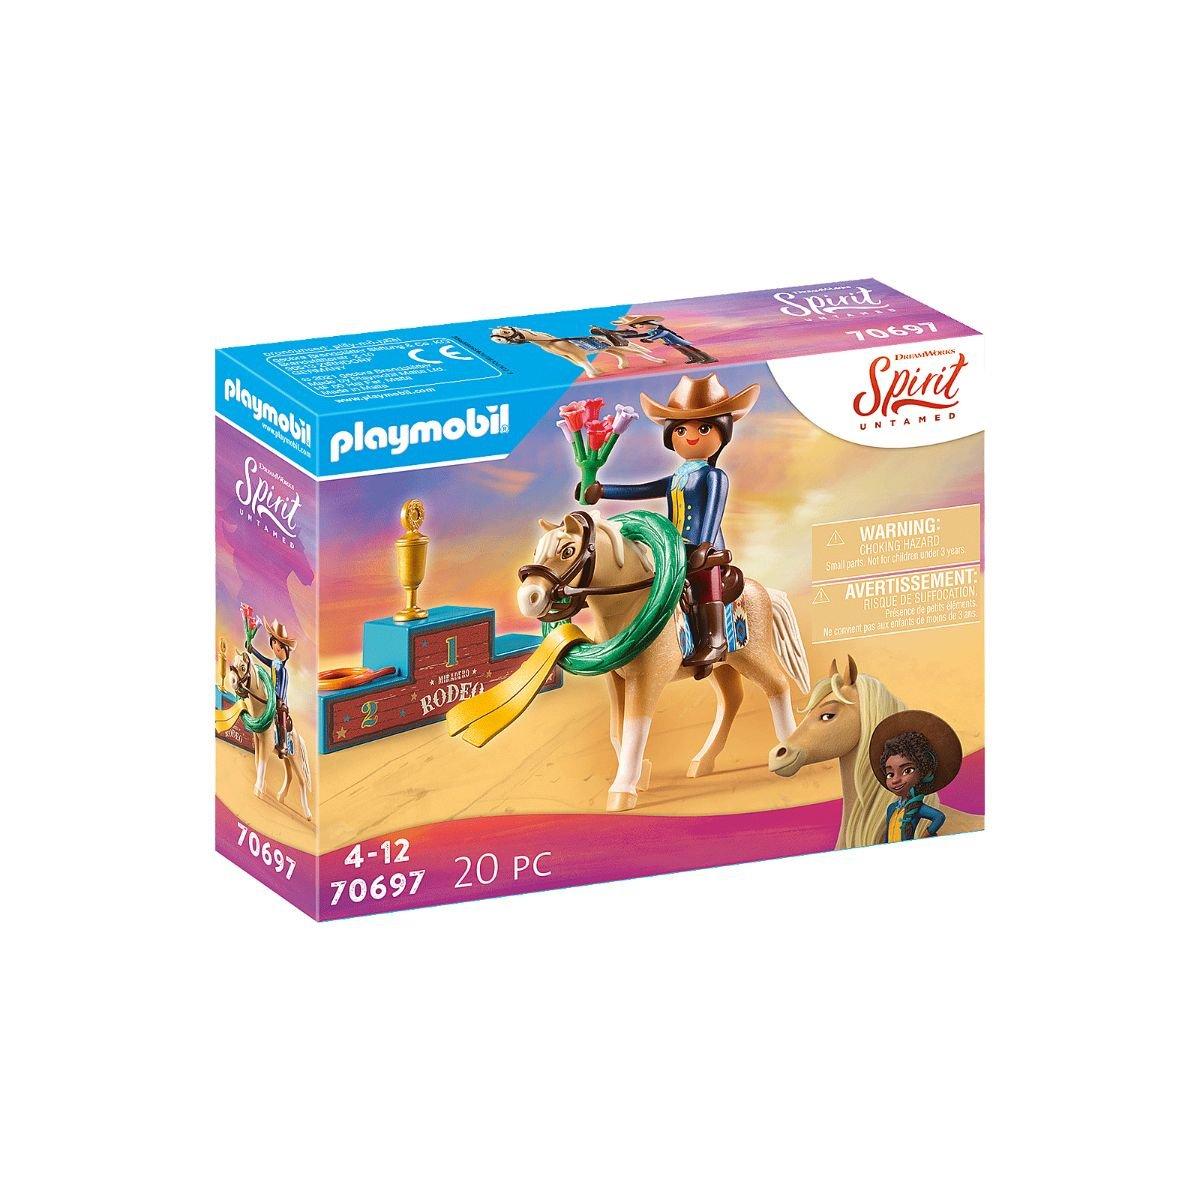 Set Playmobil Spirit - Rodeo cu Pru si Chica Linda